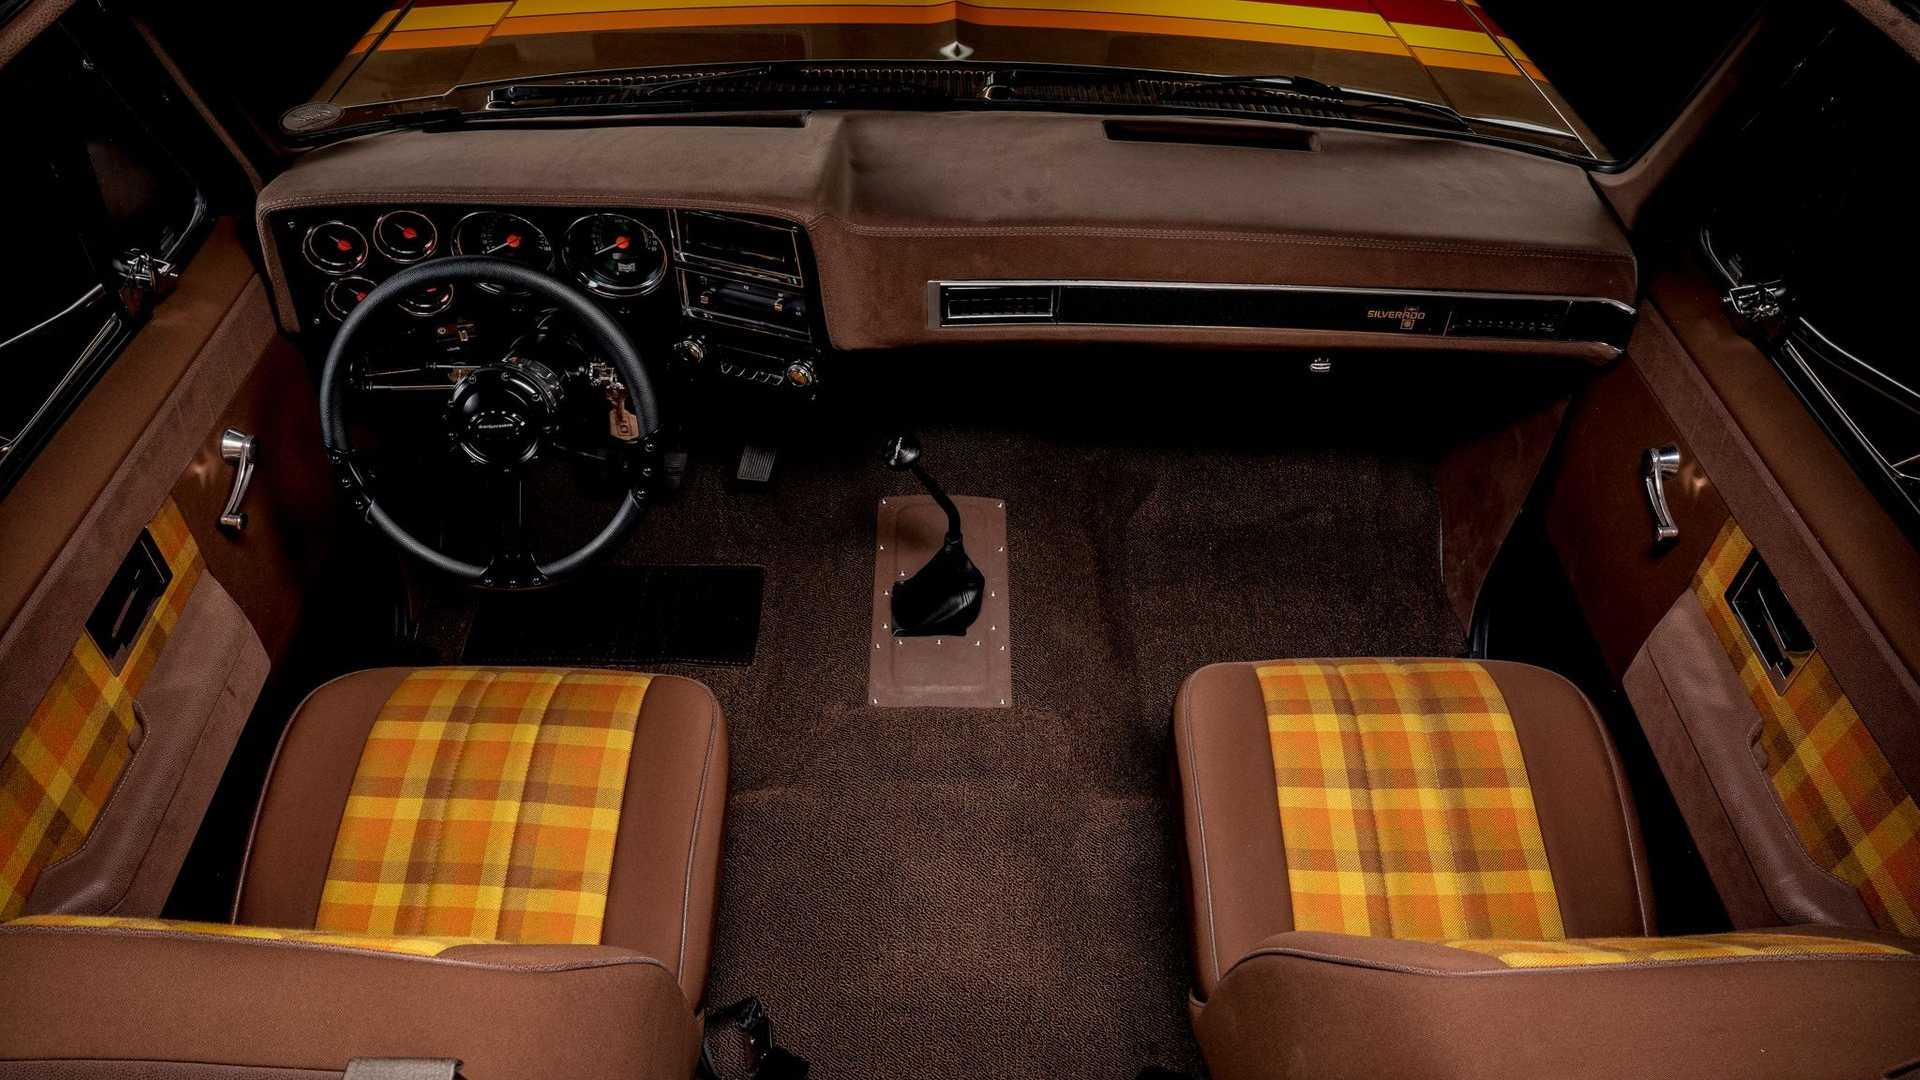 Ретро-кемпер на базе Chevrolet C30 1983 года появился в продаже